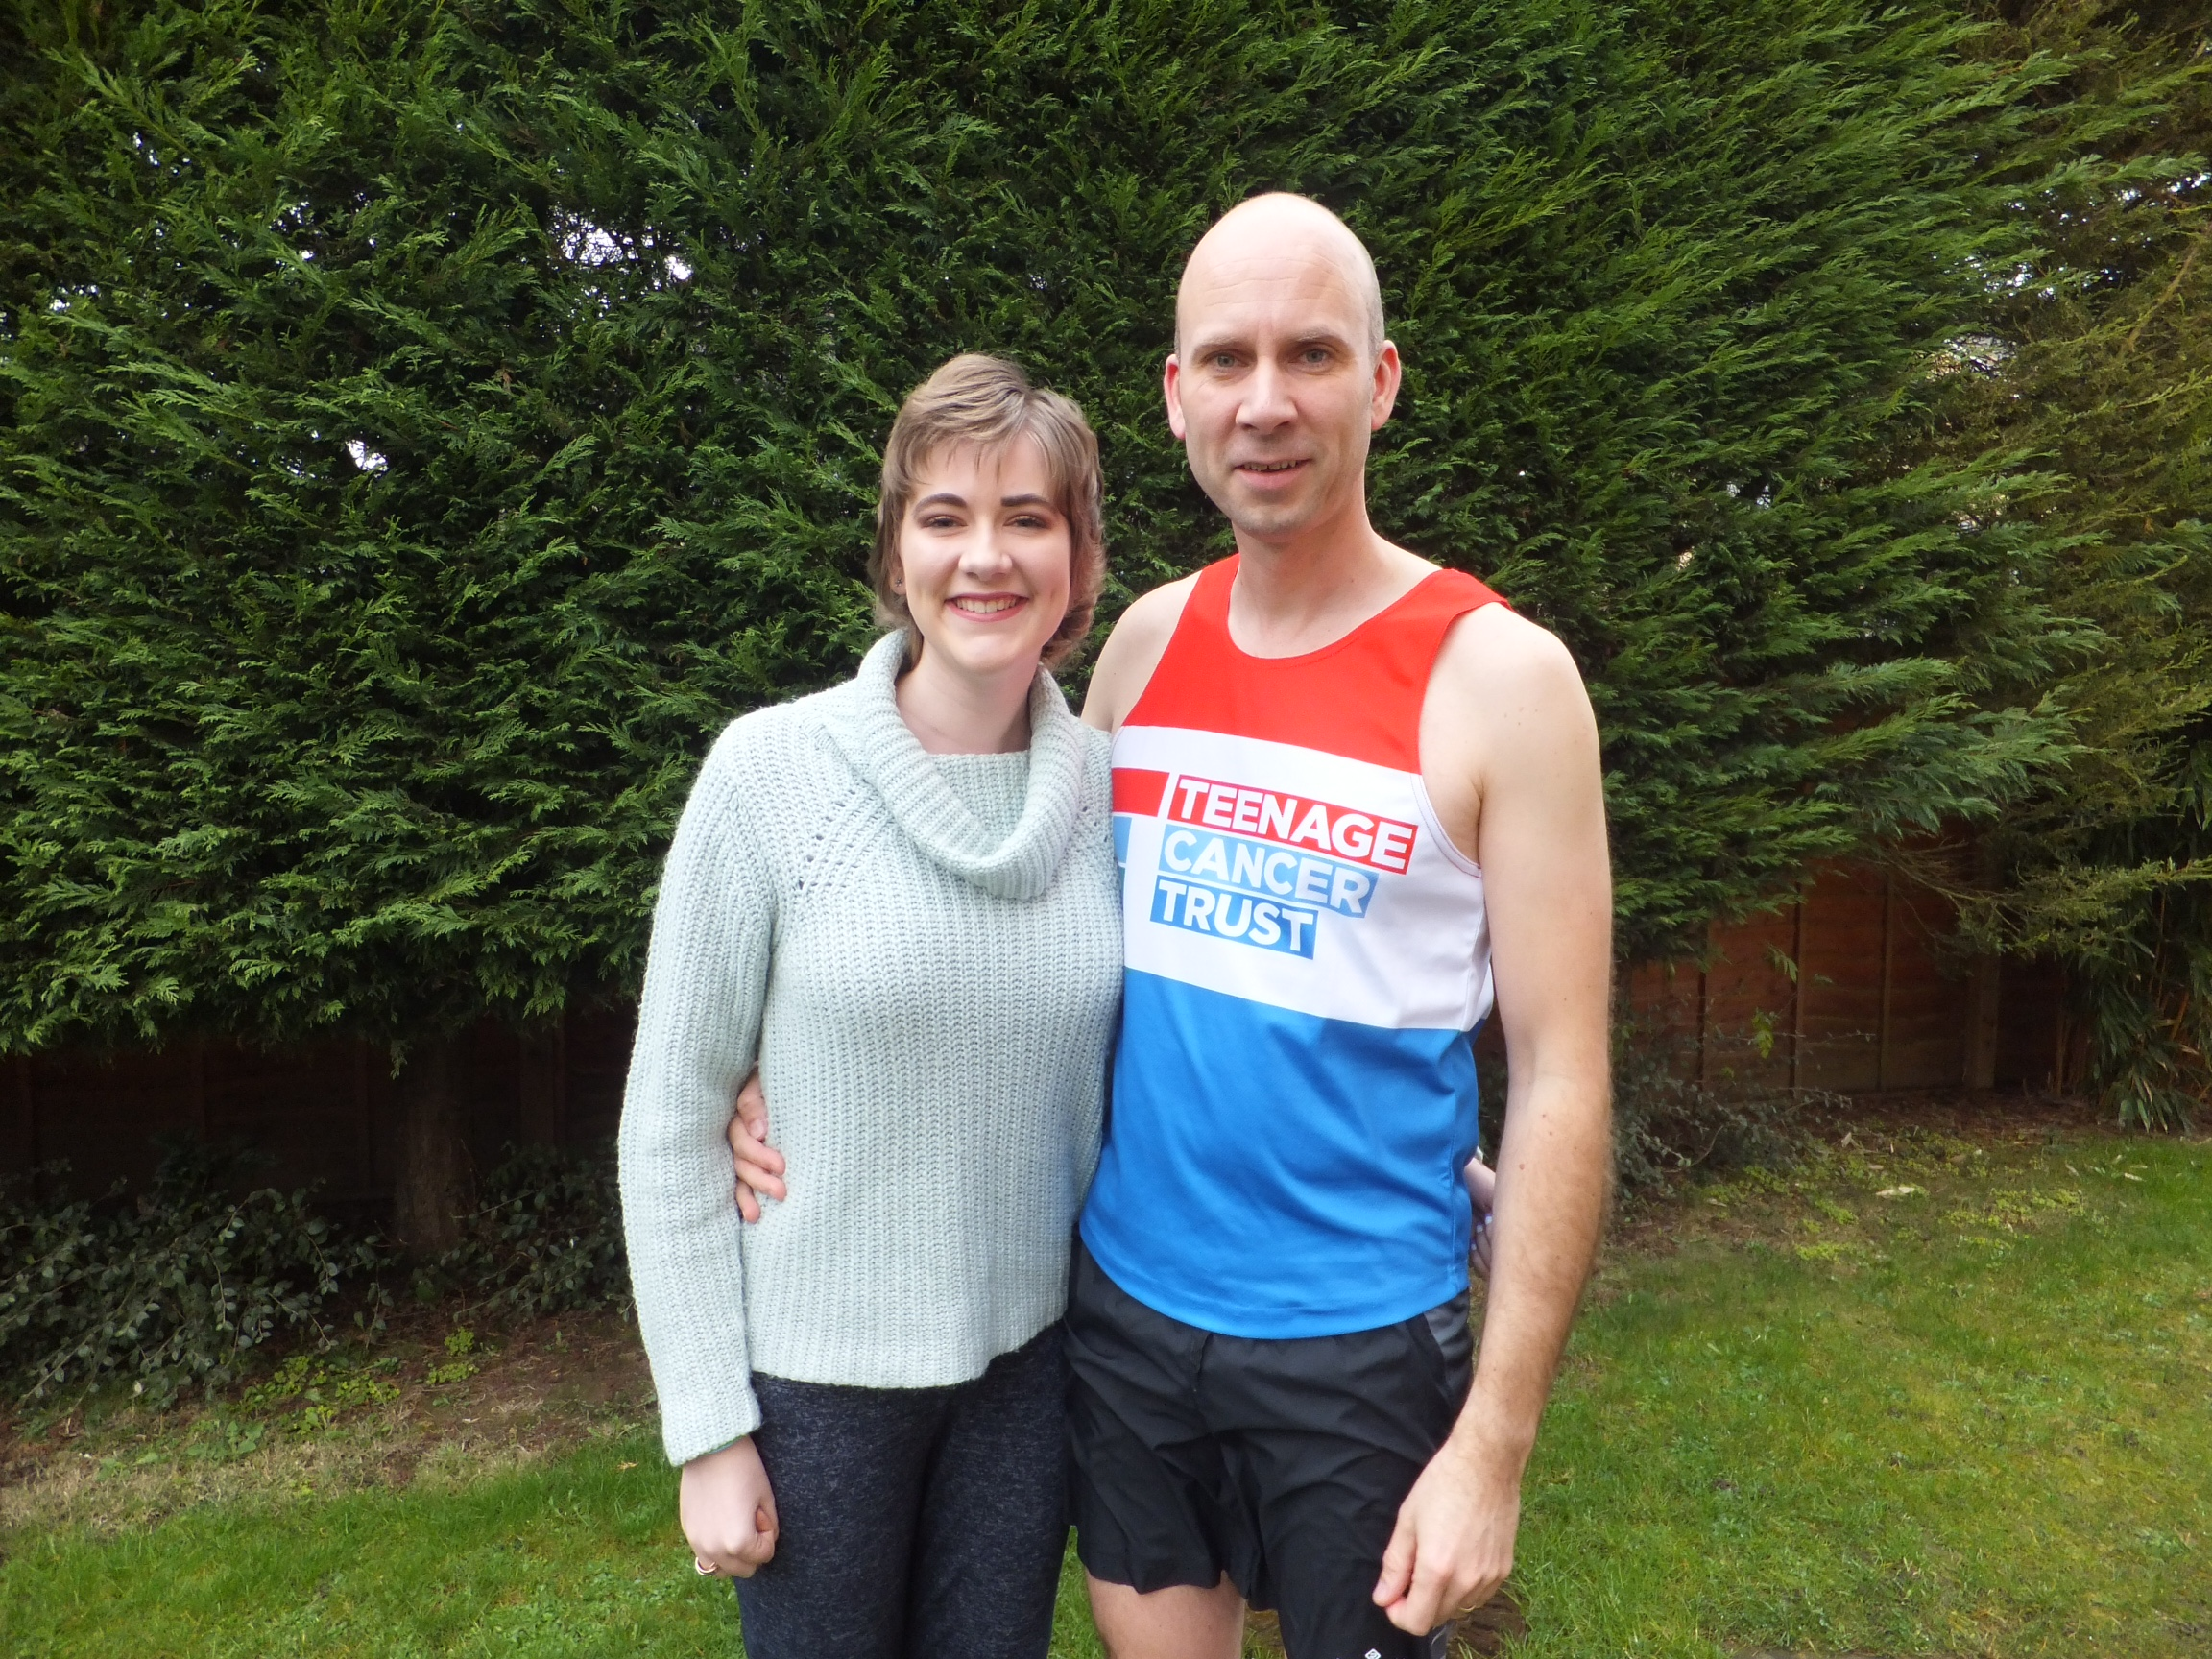 Cambs marathon runner & daughter